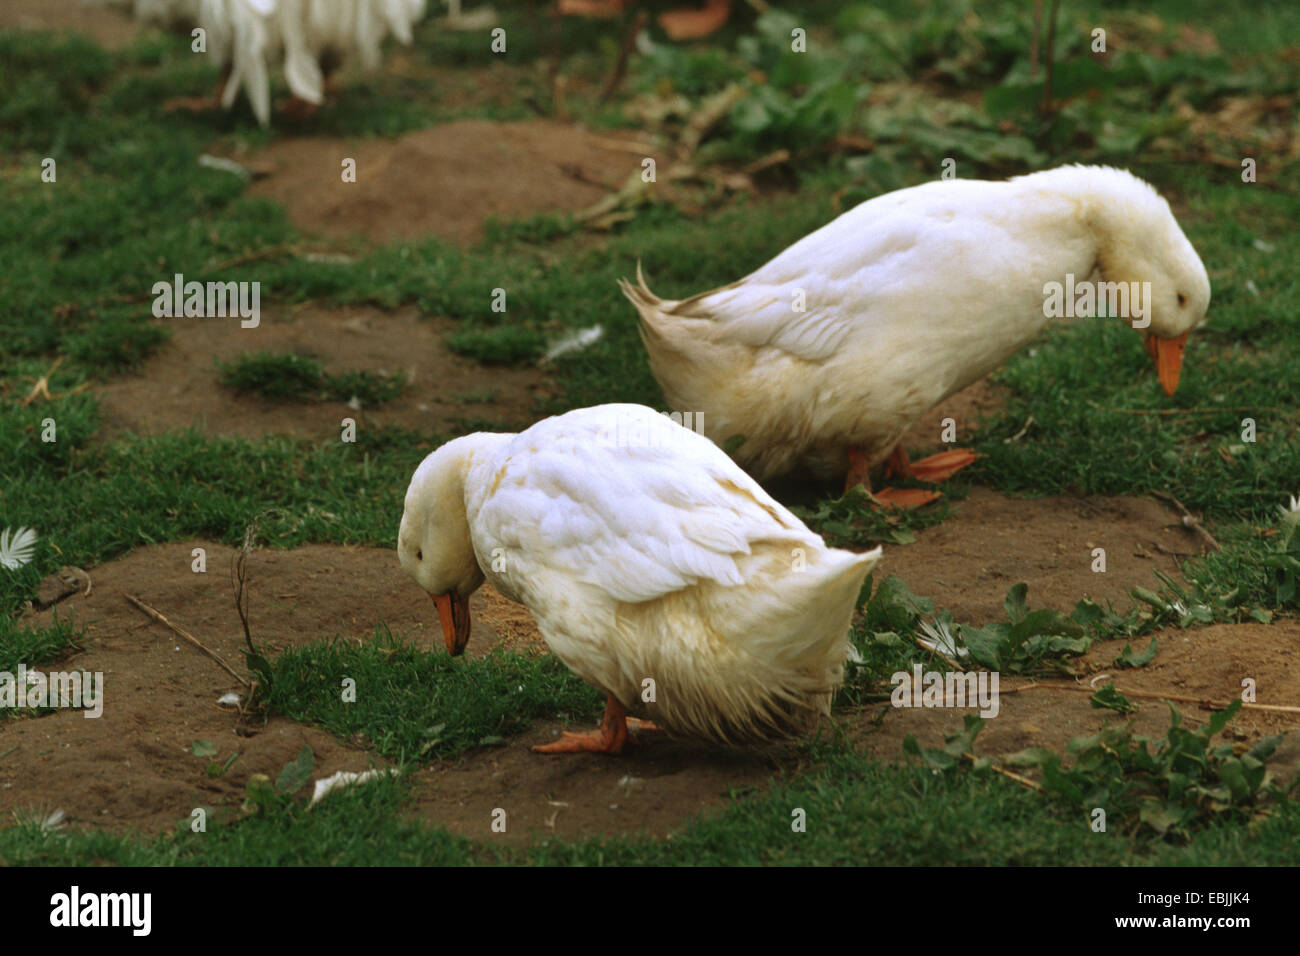 domestic duck (Anas platyrhynchos f. domestica), American Pekin ducks in a meadow - Stock Image